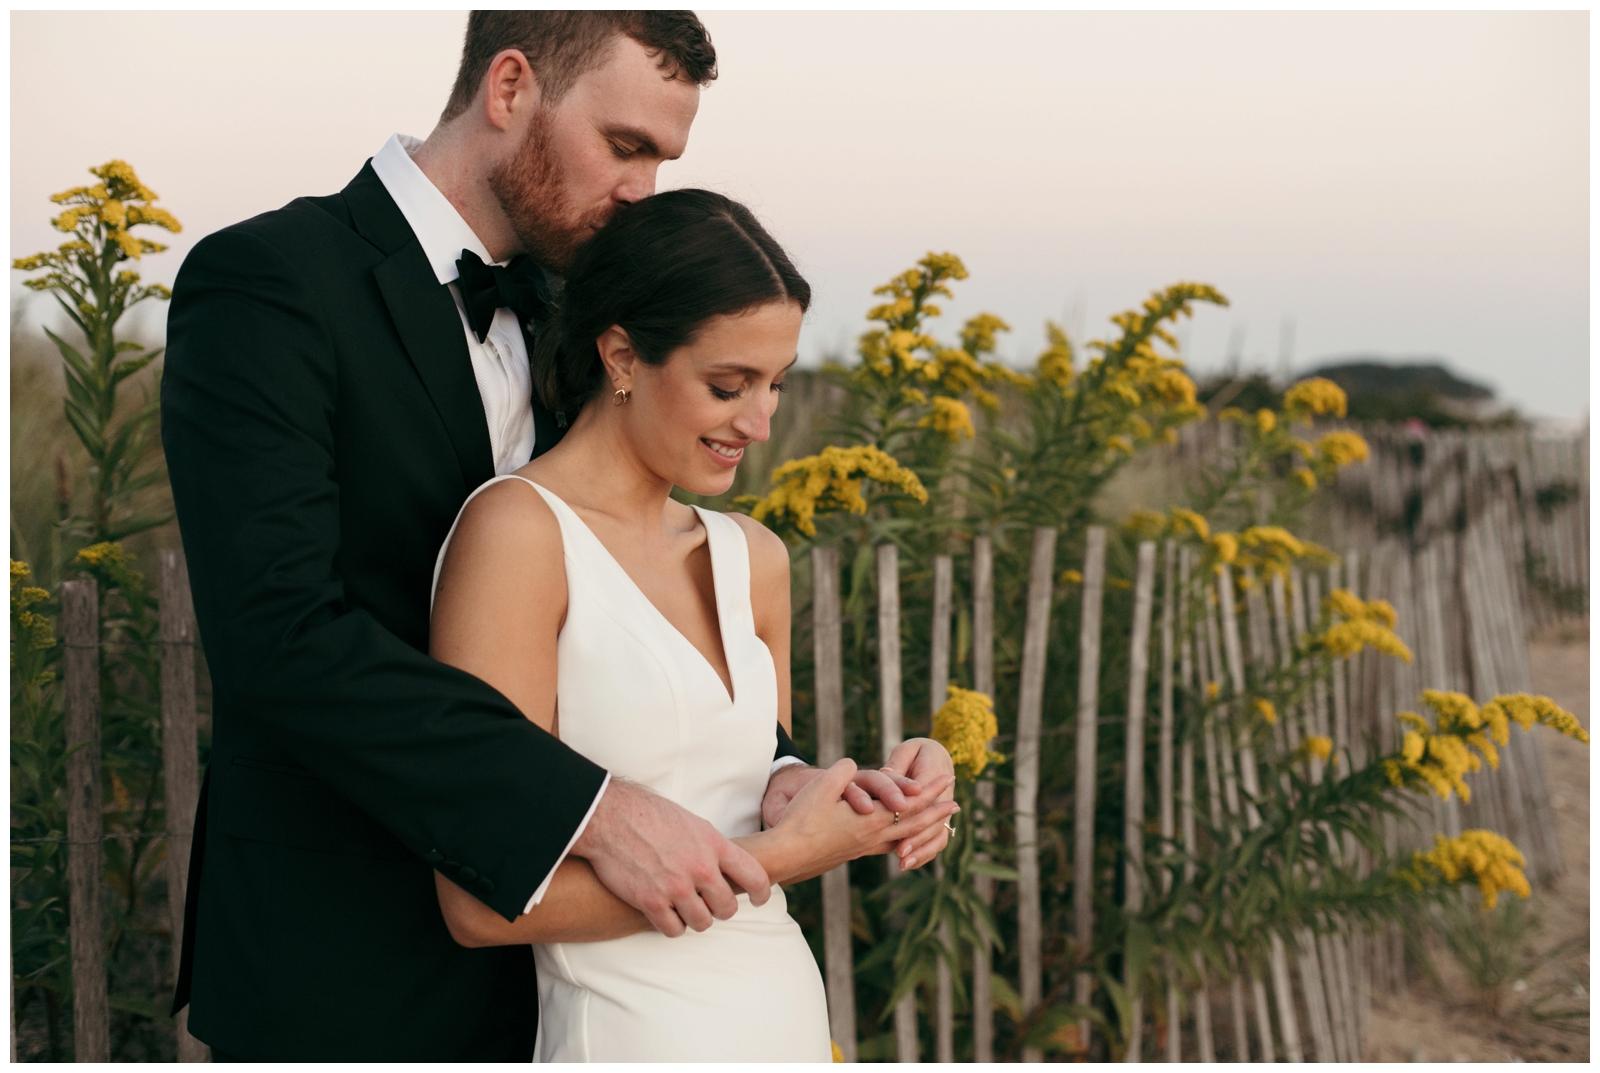 Madison-Beach-Hotel-Wedding-Bailey-Q-Photo-Boston-Wedding-Photographer-053.jpg